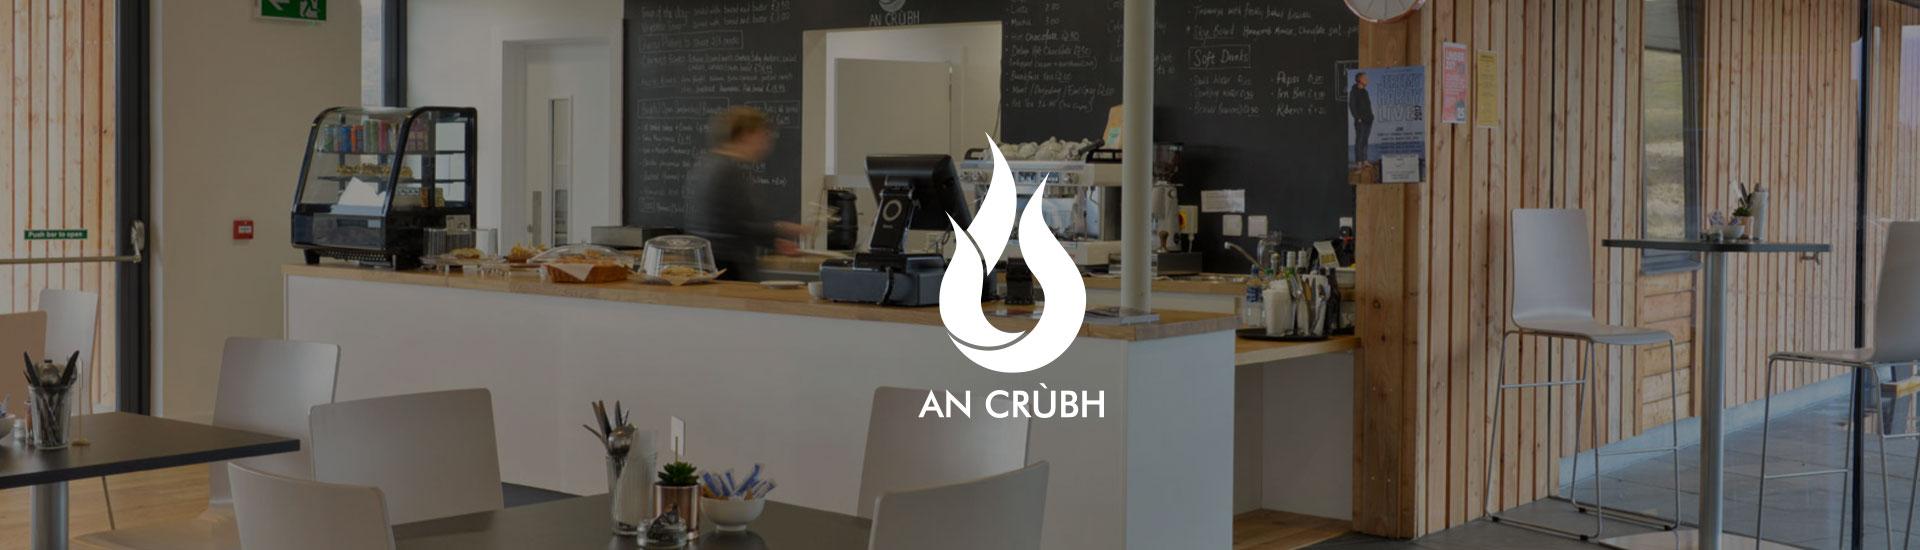 an crubh logo